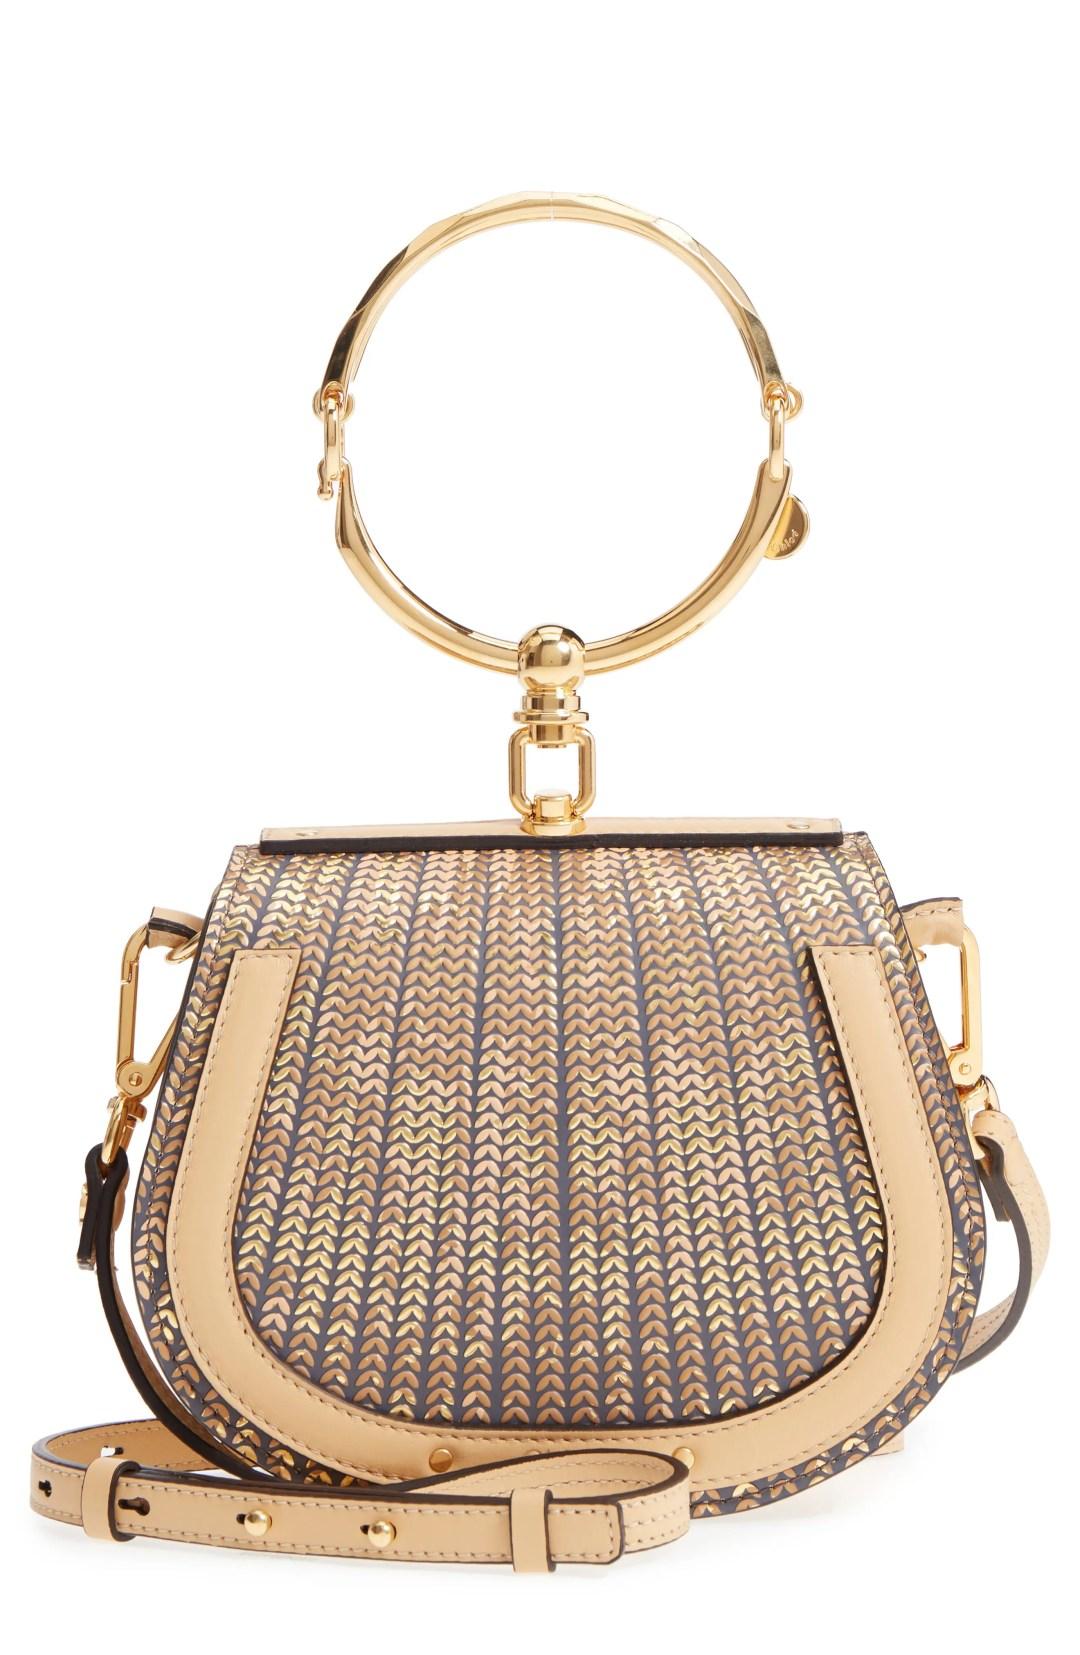 8bf832ff9 Chloé Small Nile Sequin Leather Bracelet Crossbody Bag